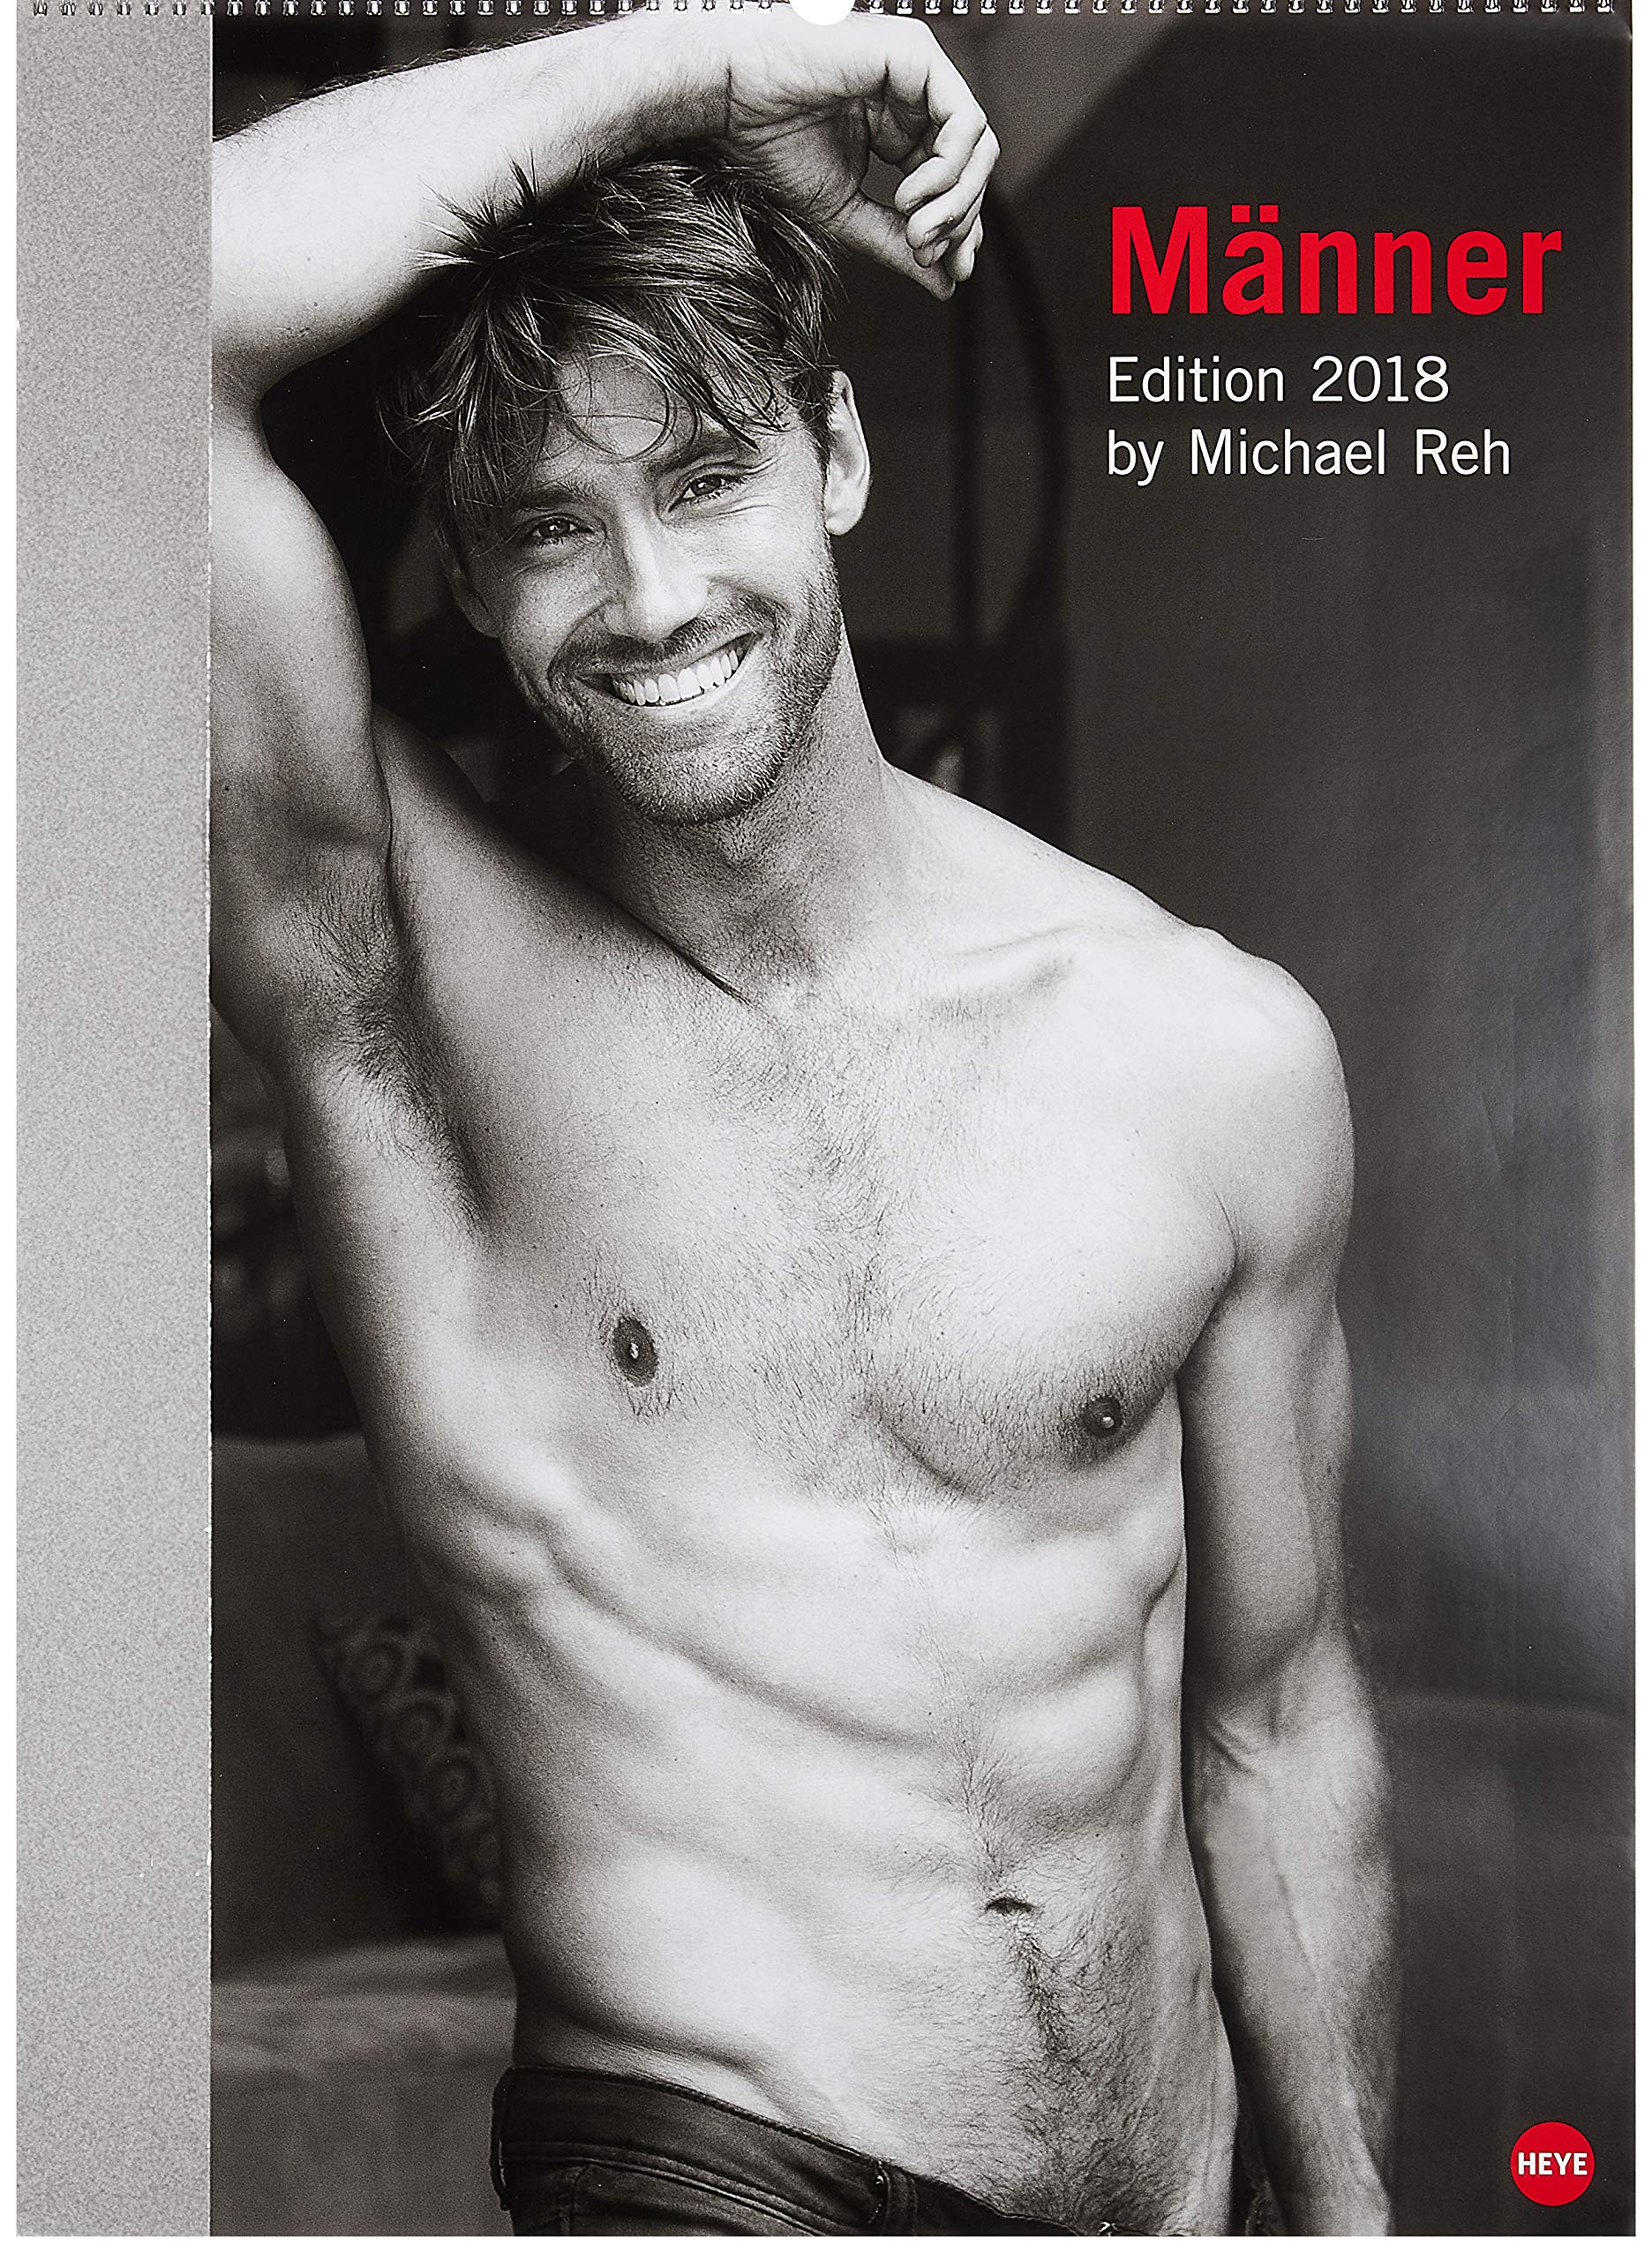 Männer Edition - Kalender 2018 Kalender – 16. Mai 2017 Michael Reh 3840148820 Fotografie Akt (Fotografie) (Kalender)